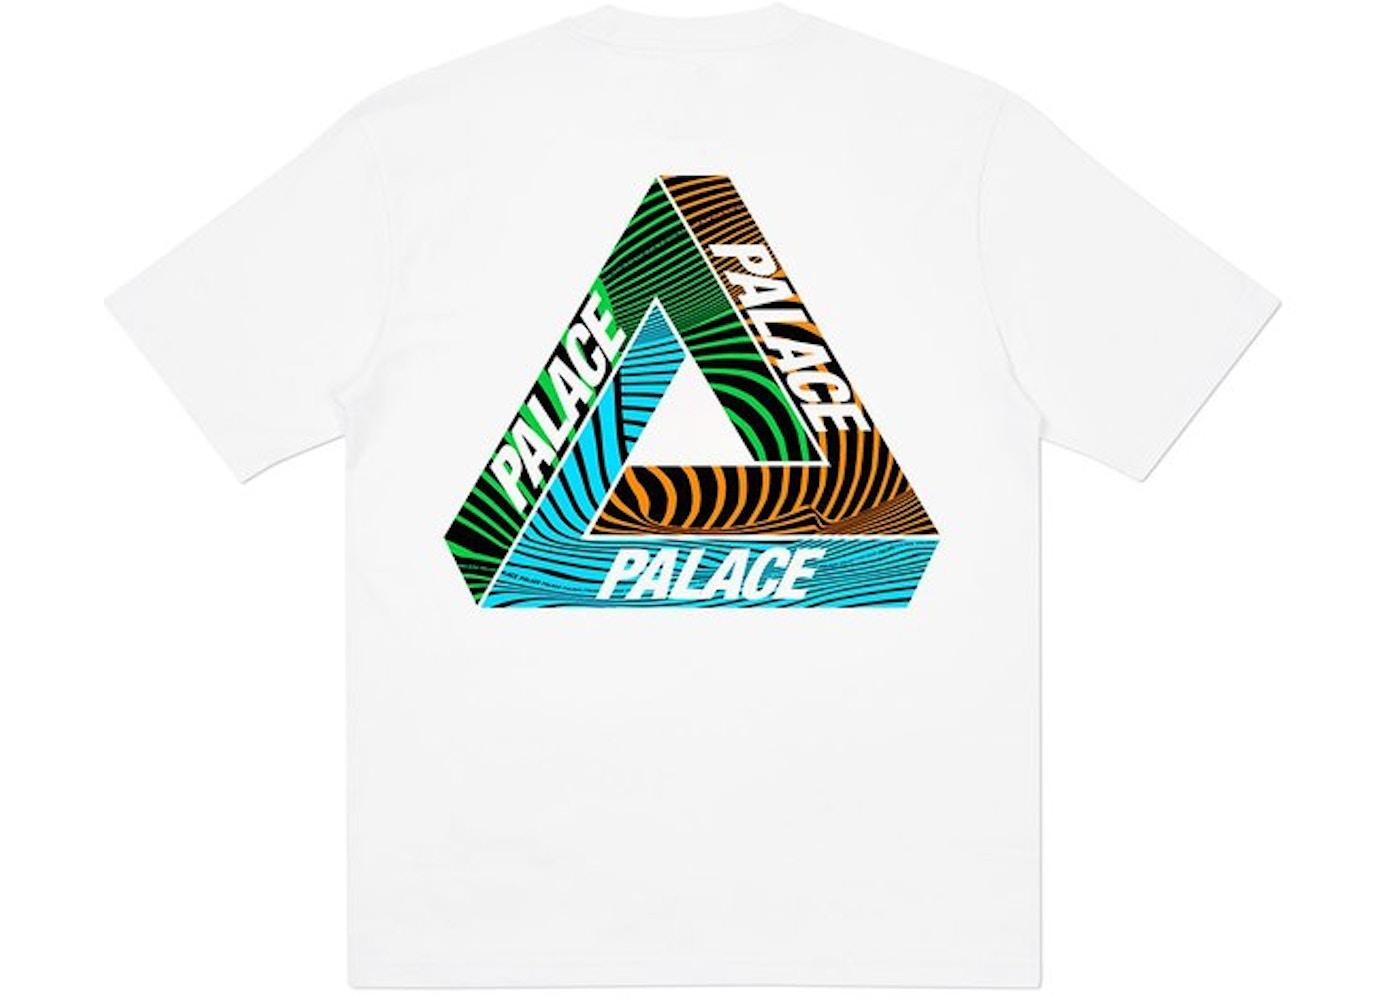 Palace Tri-Tex T-Shirt White - SS20